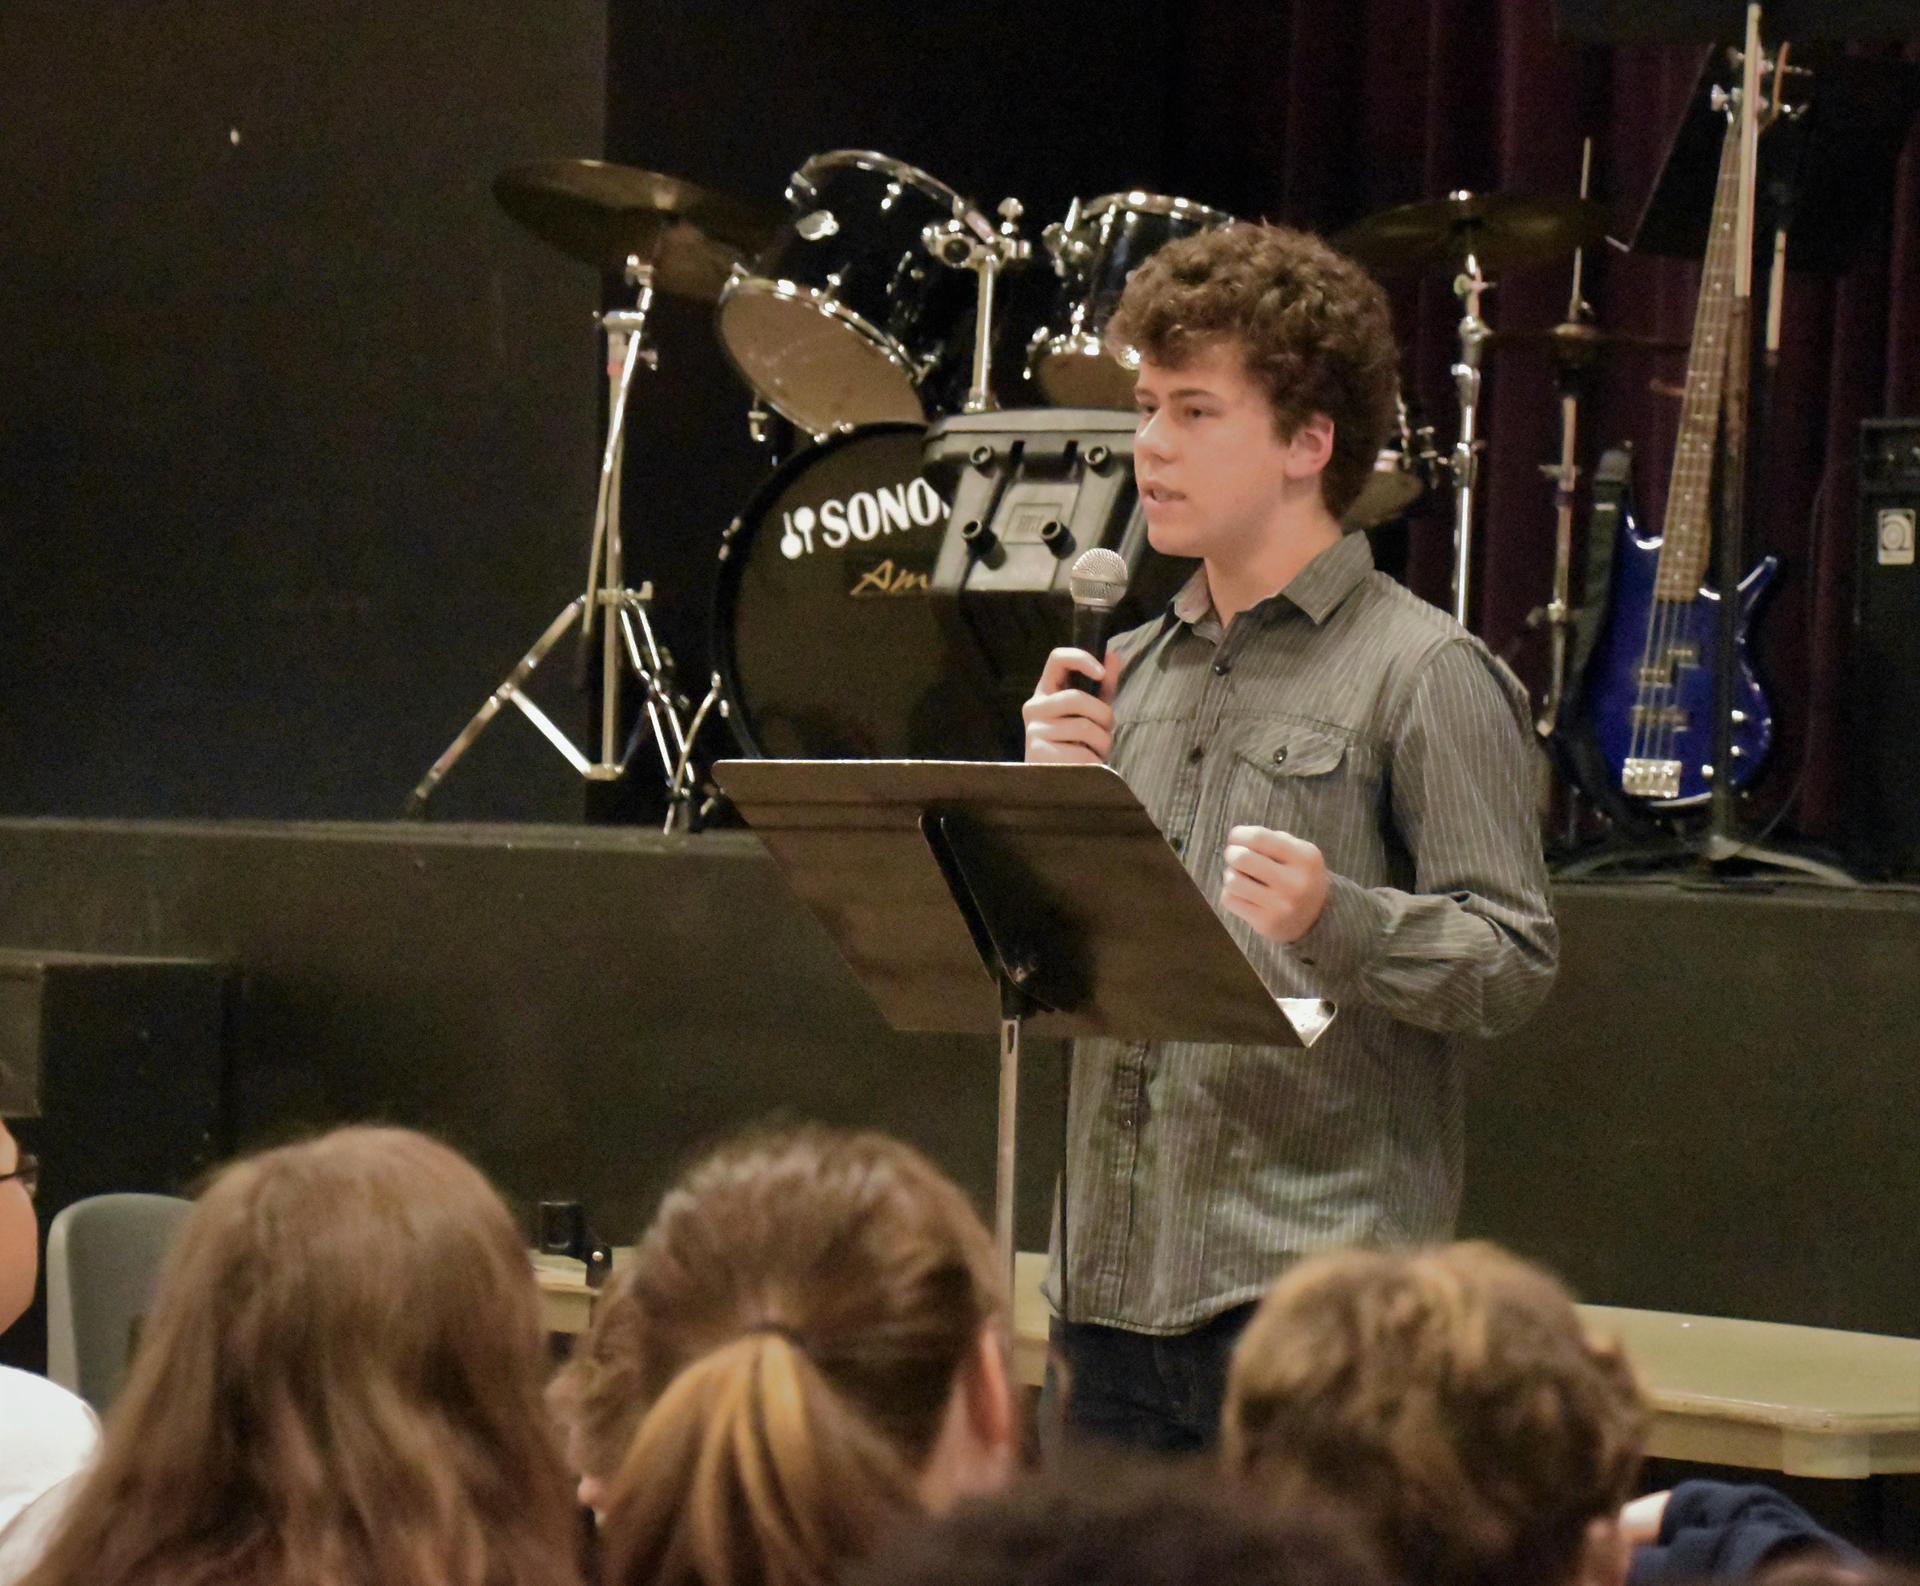 Alum Johnny Humphrey '18 speaking at chapel